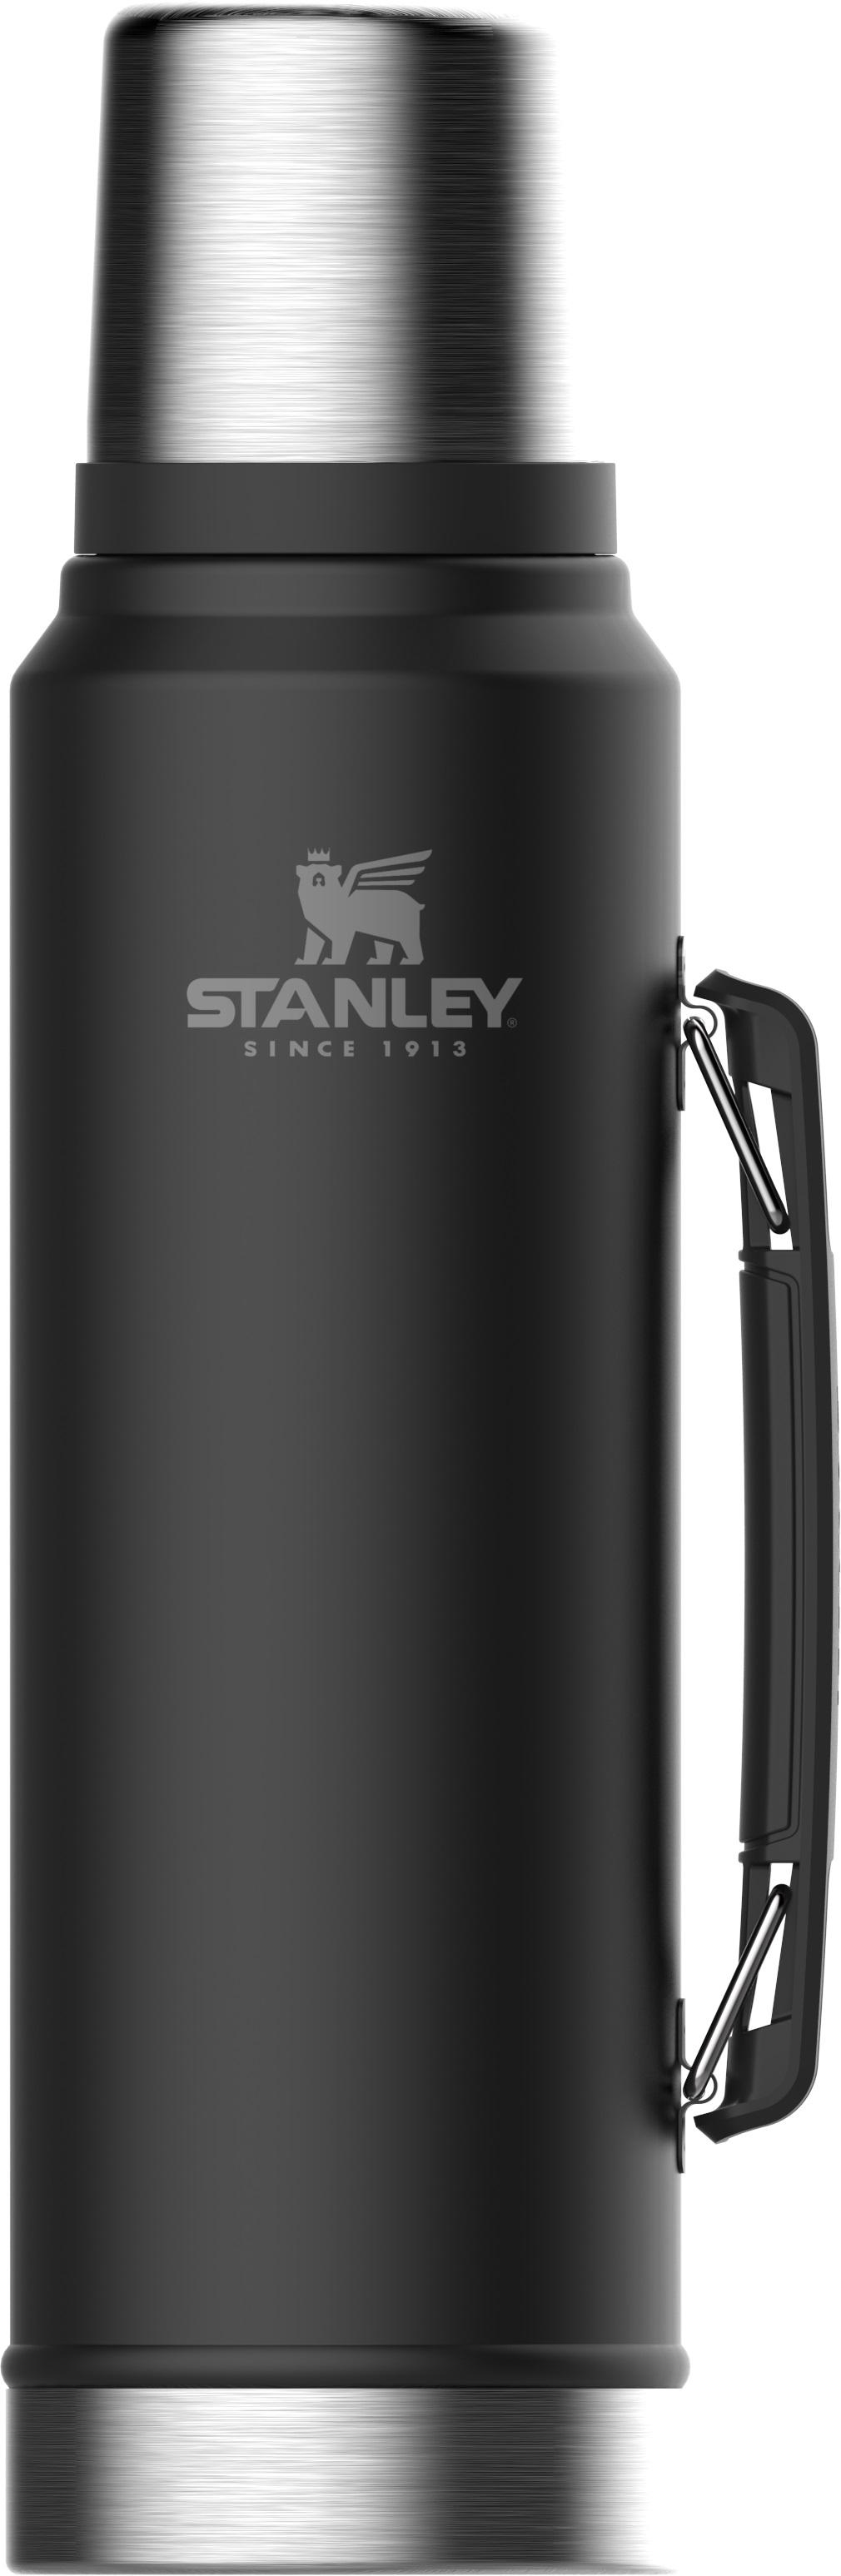 Stanley Termoss Classic 1L mateti melns termoss